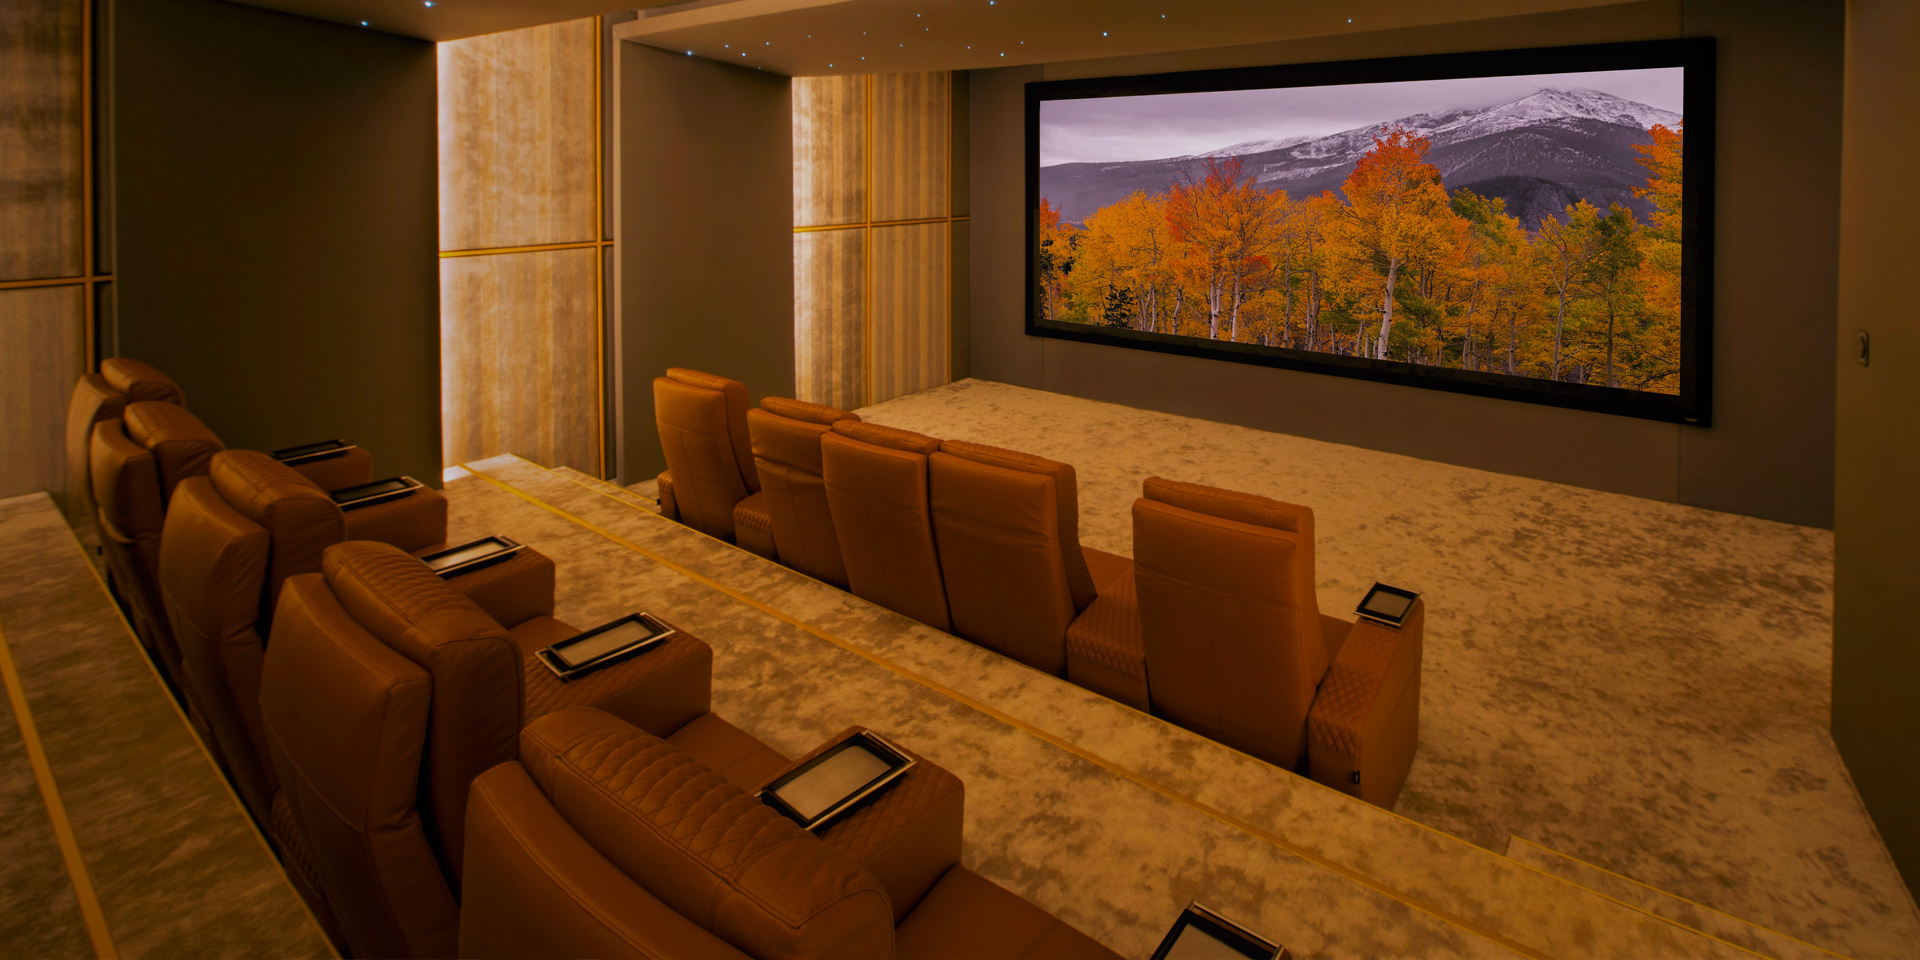 Home Theater cineak cinema ferrier seat modern